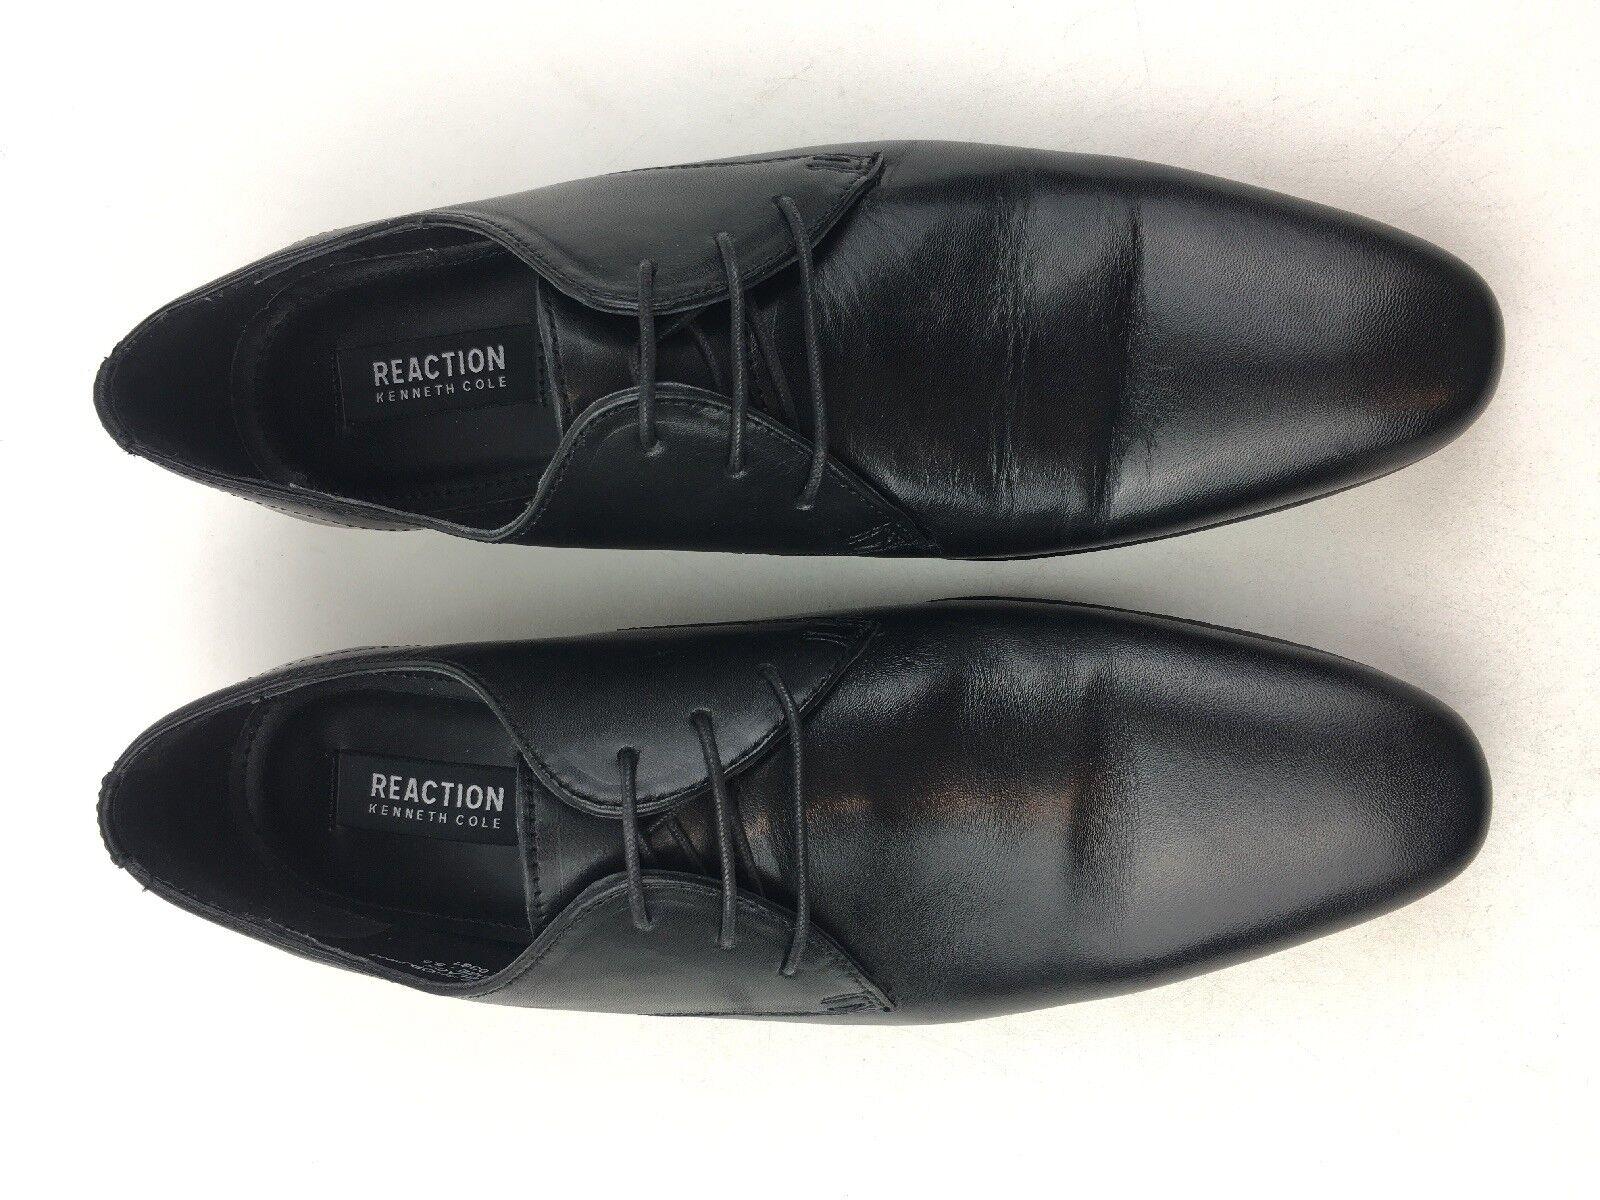 Kenneth Cole Reaction Shop-Ping List Lace Up Oxfords Men's Size 9.5, Black 1054